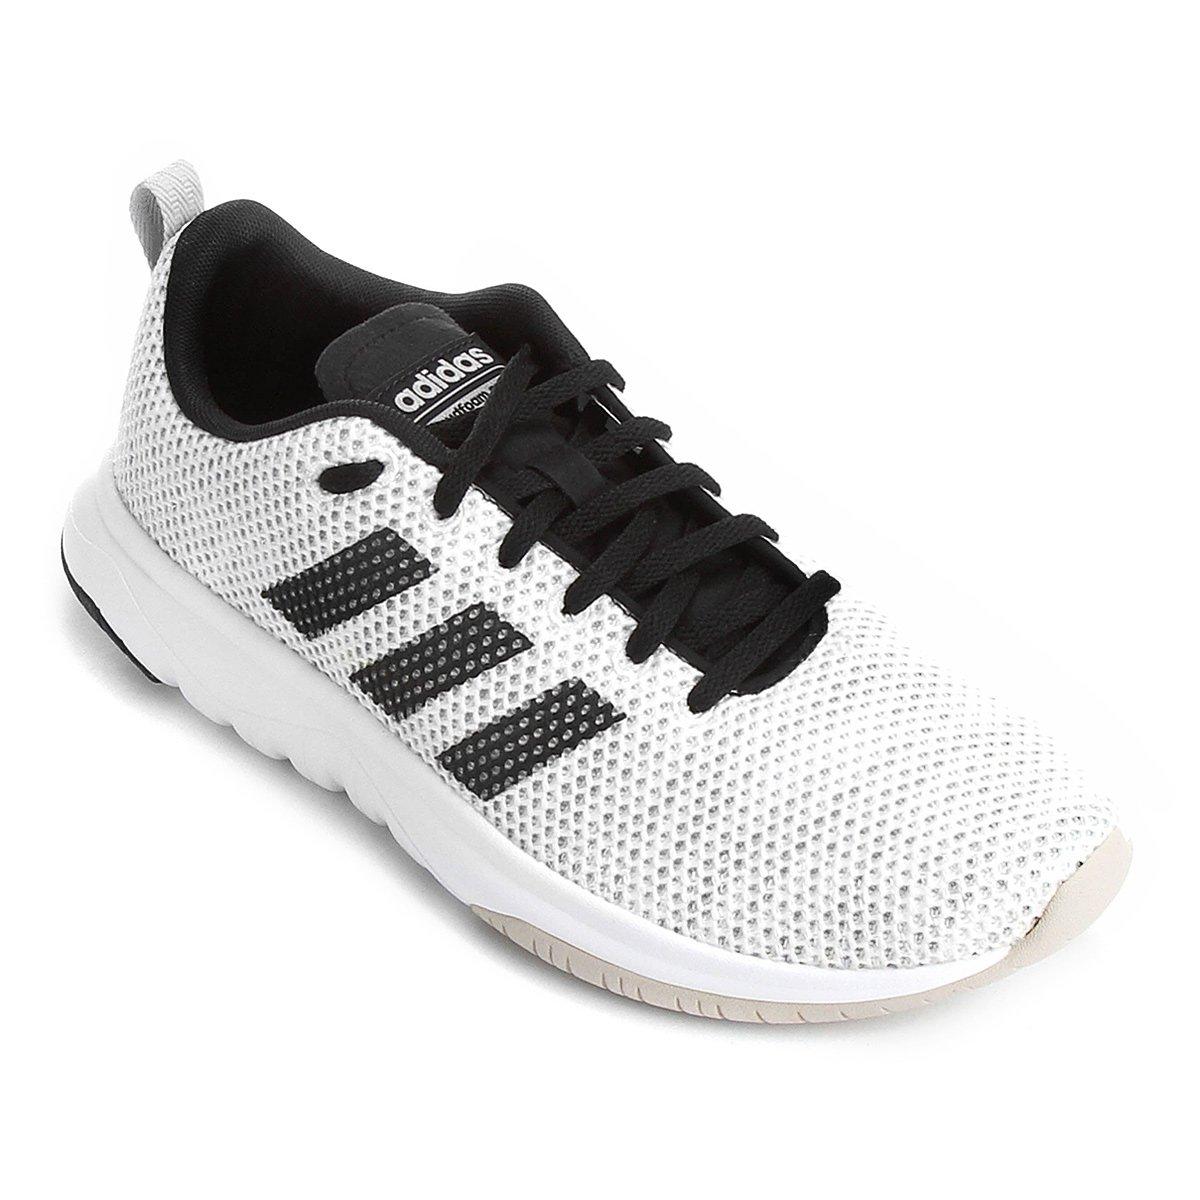 Tênis Adidas Cloudfoam Superflex Masculino - Branco e Preto - Compre ... 97056f7f6ab98